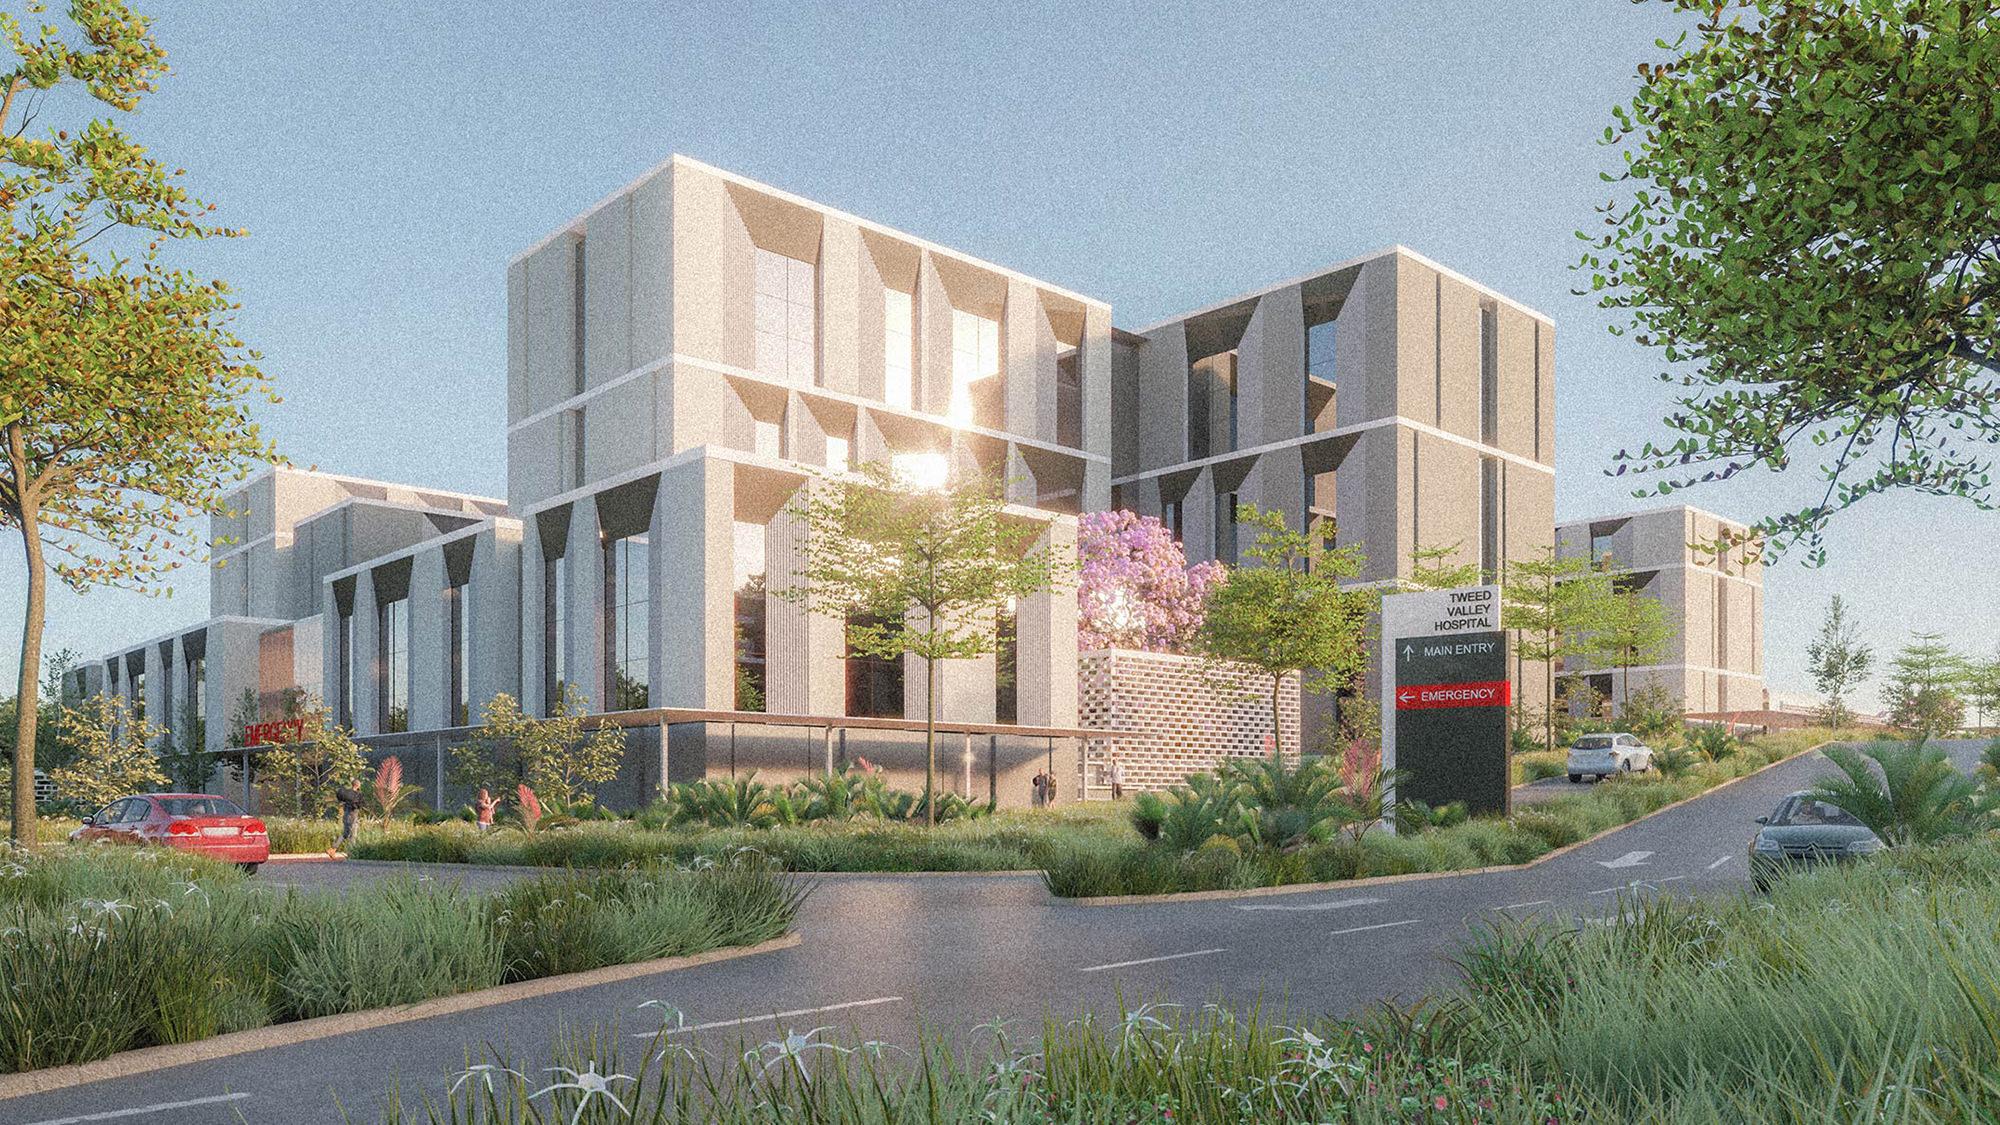 tweed-hospital-project-image